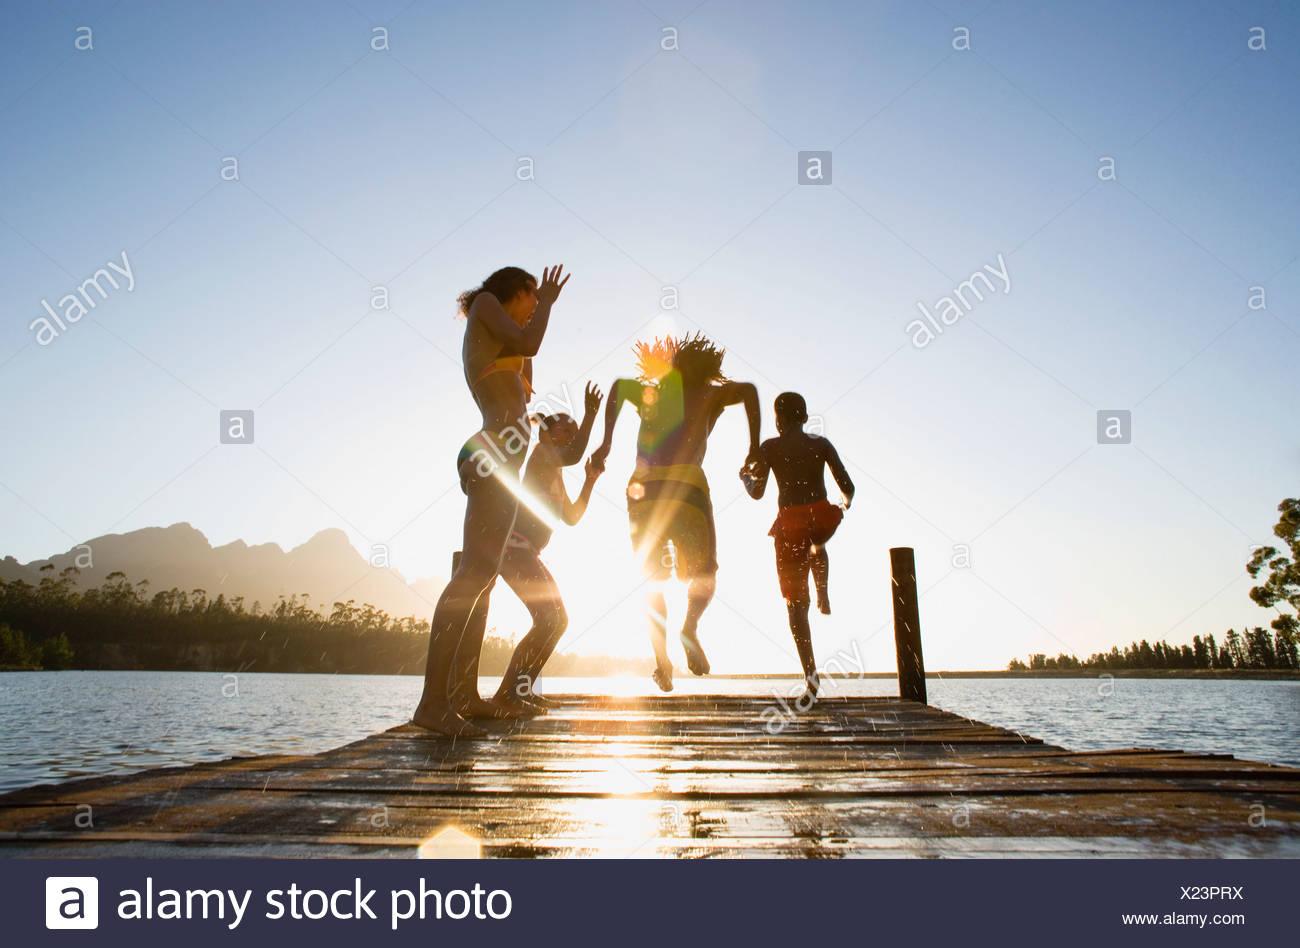 Familie in Badebekleidung entlang Steg springen in See bei Sonnenuntergang Rückansicht Oberfläche Ebene Blendenfleck Stockbild